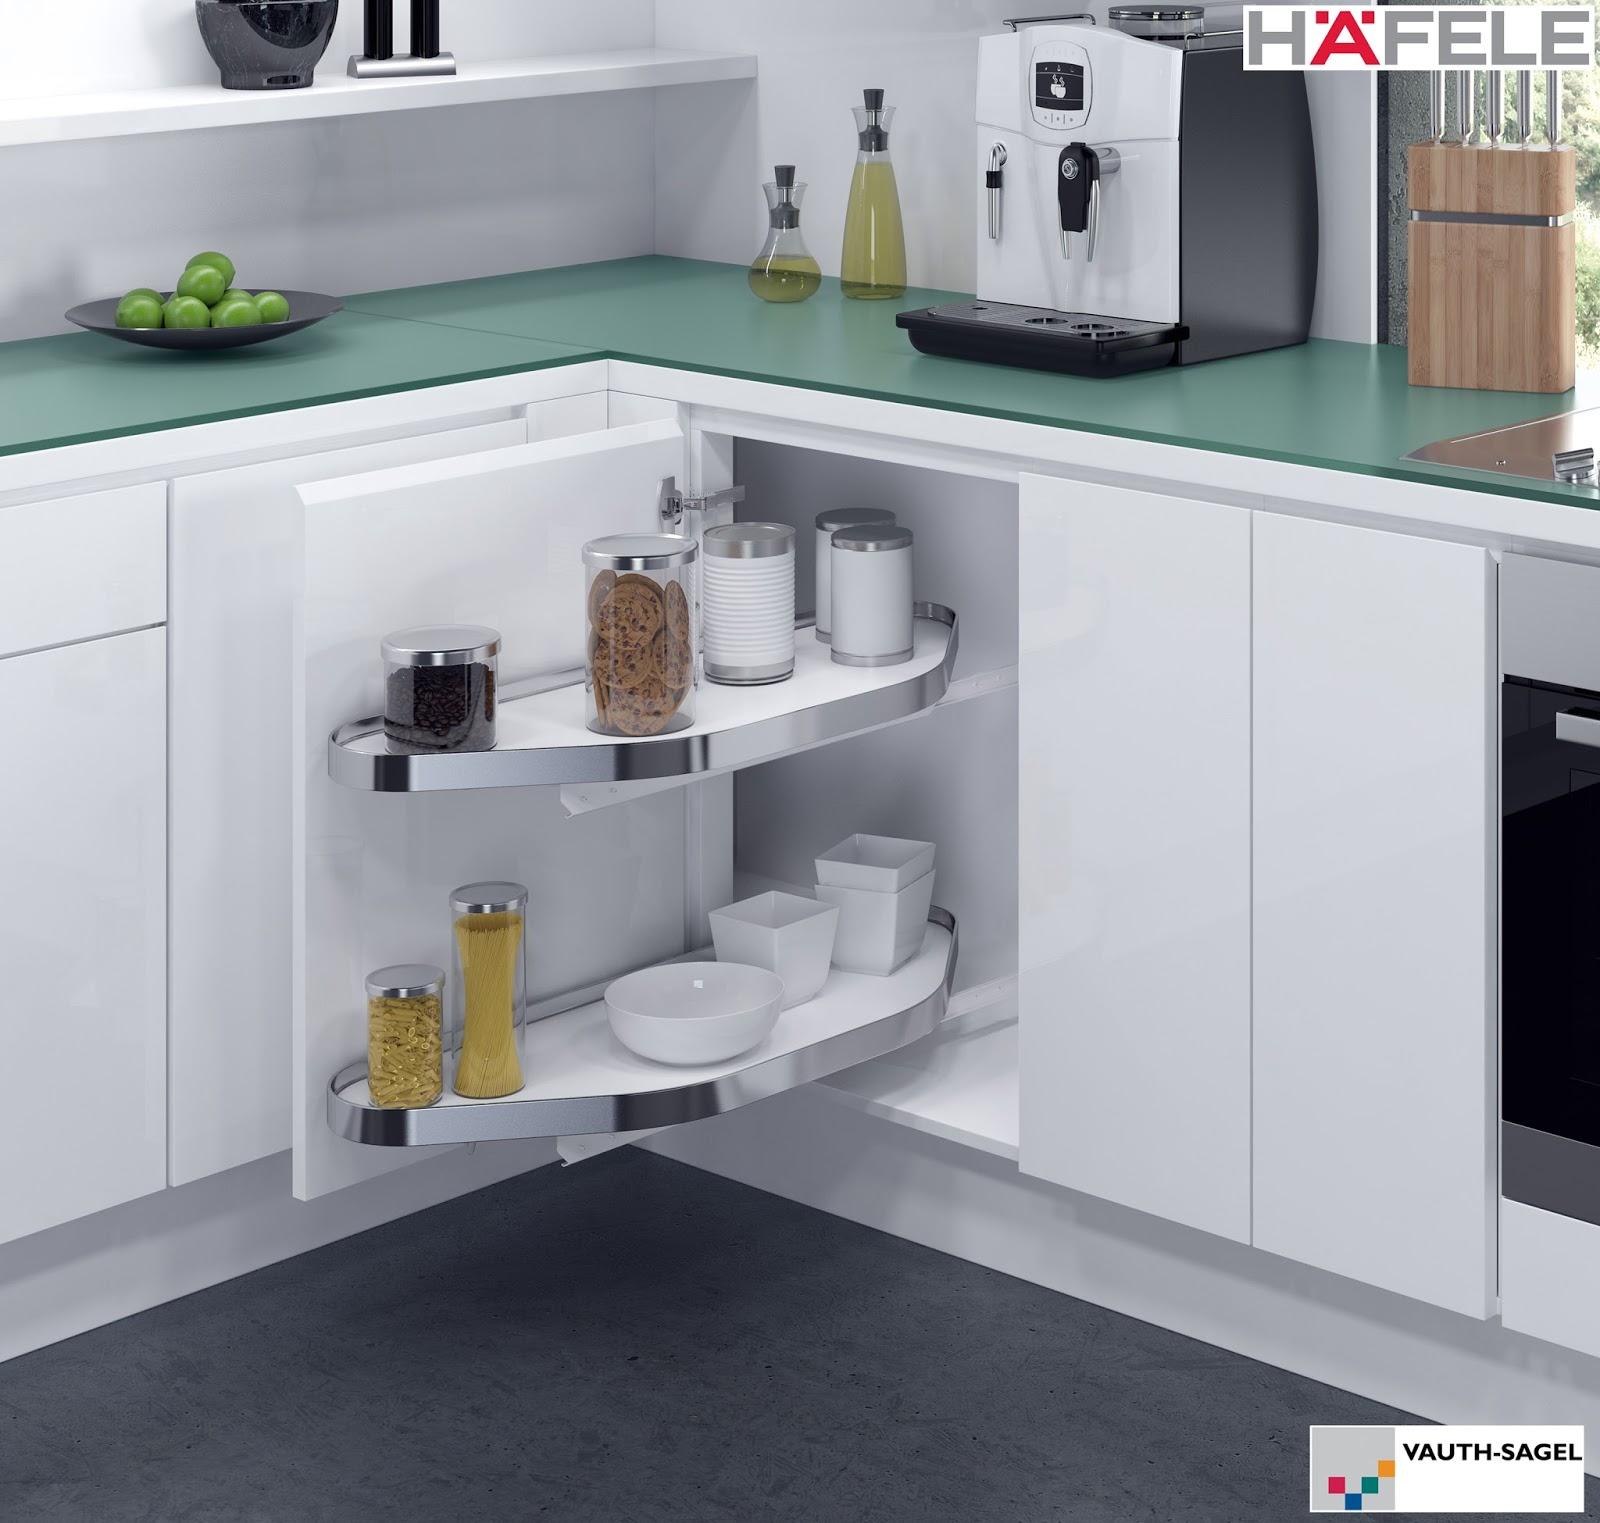 Elegant Hafele Kitchen India Design Ideas